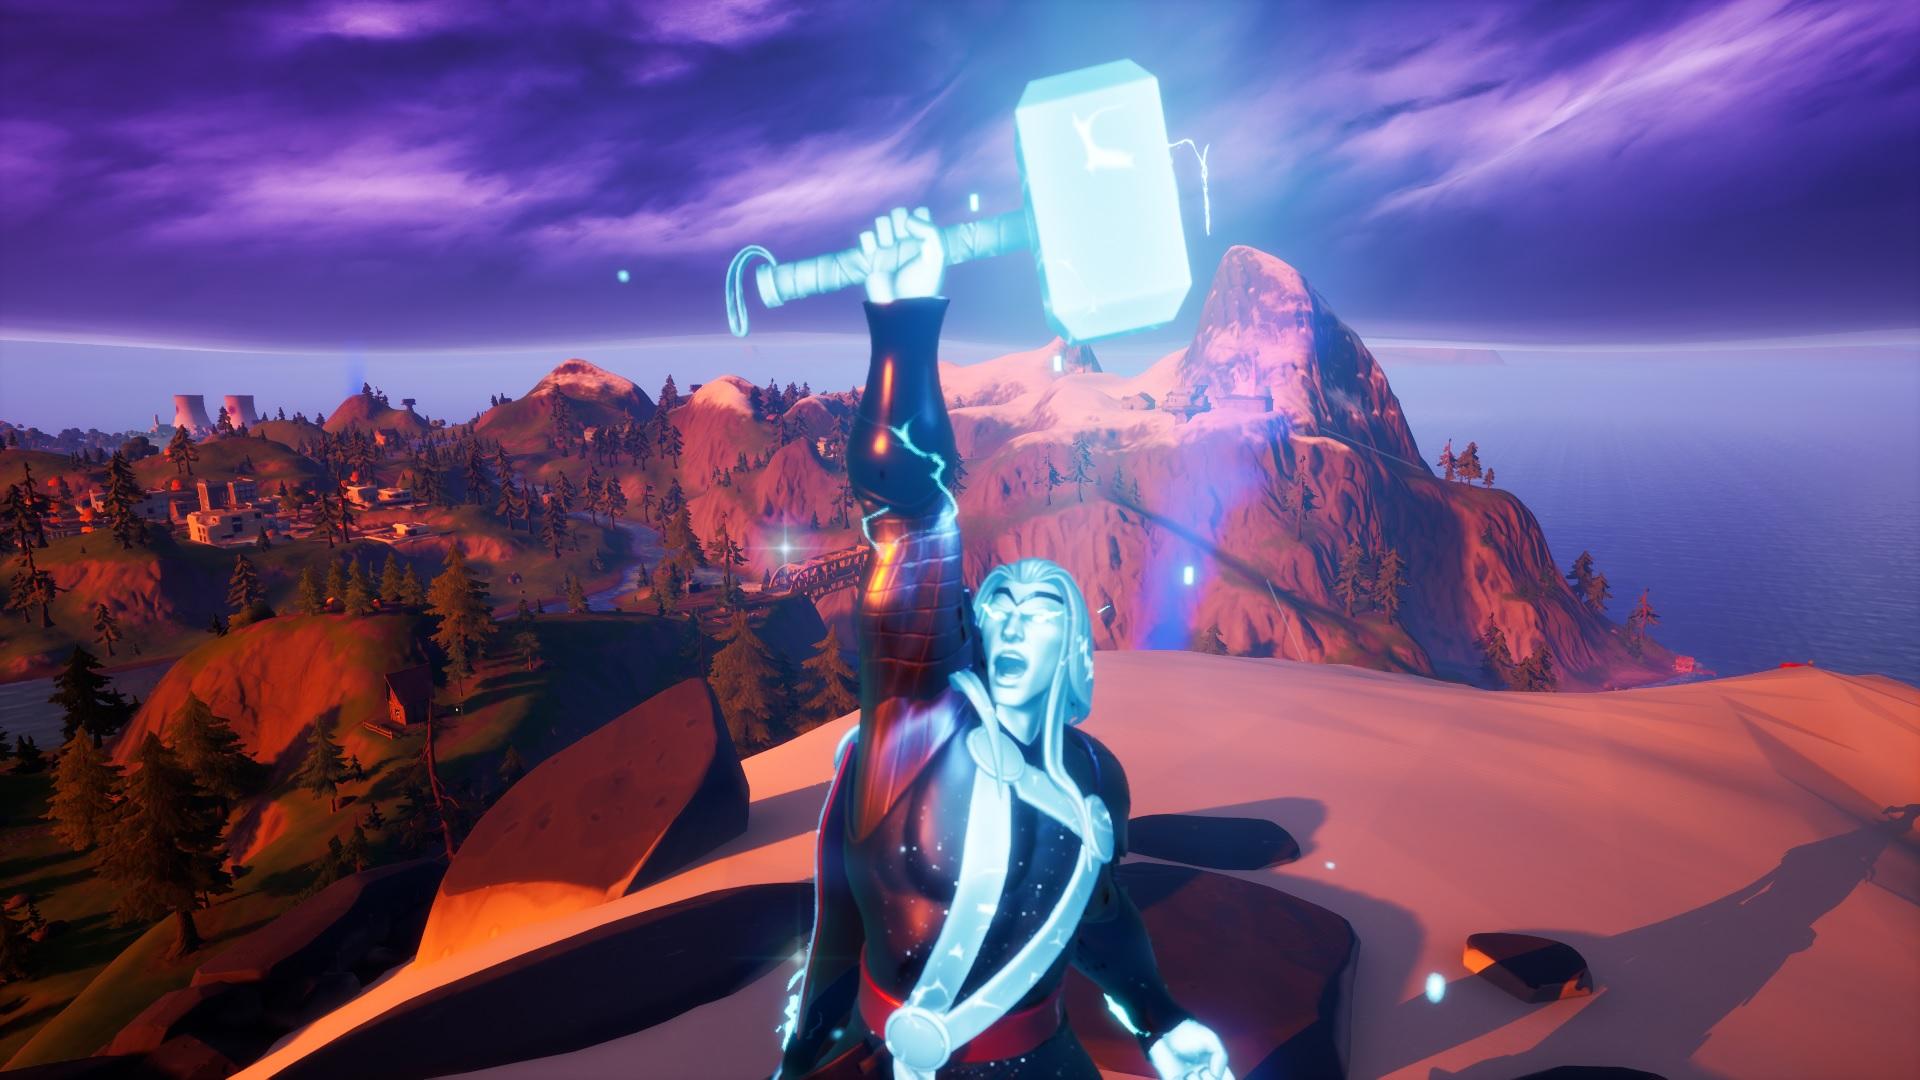 Thor Awakening Challenge Guide How To Get The God Of Thunder Emote In Fortnite Pc Gamer